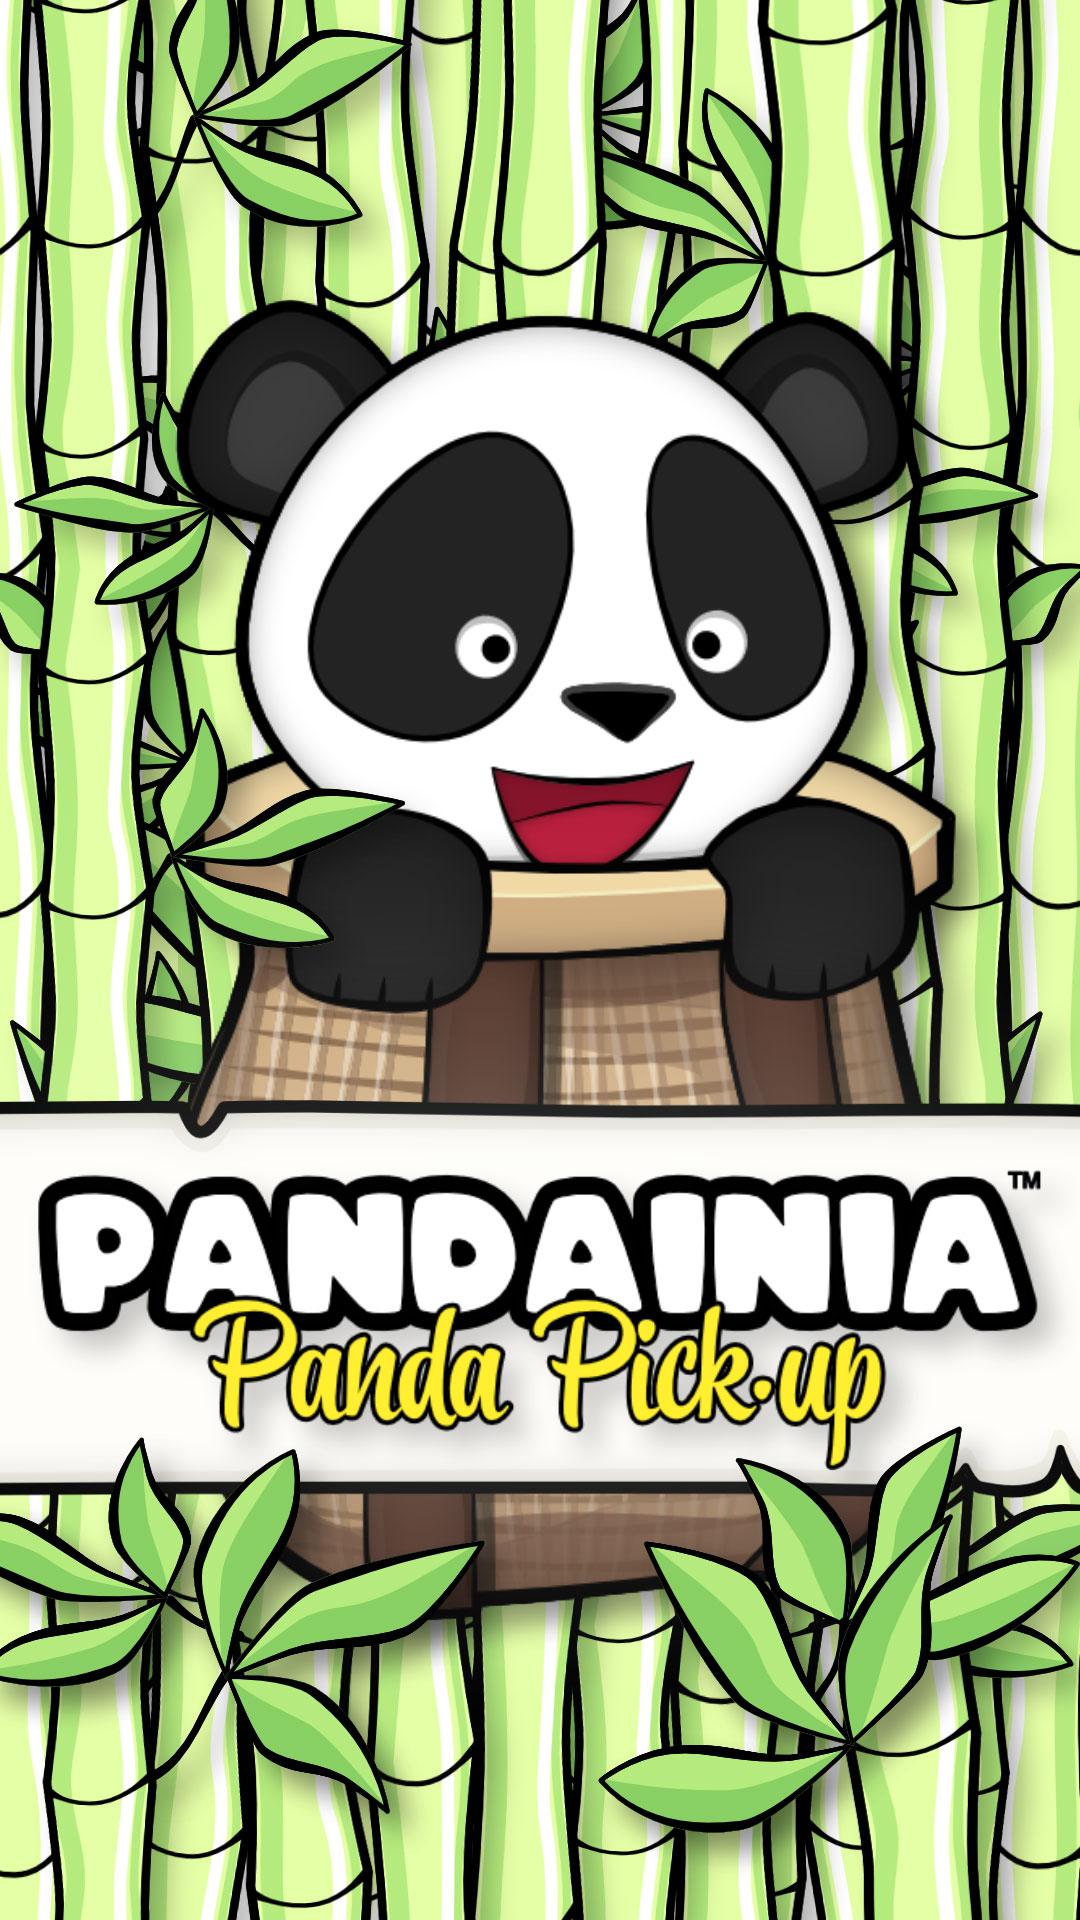 PANDAINIA Panda Pick-Up Mobile Title